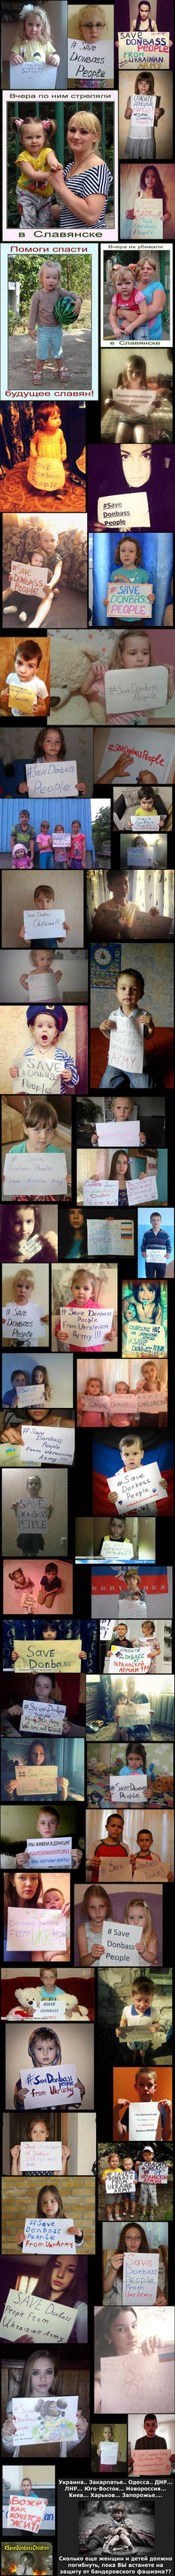 Save Donbass Children